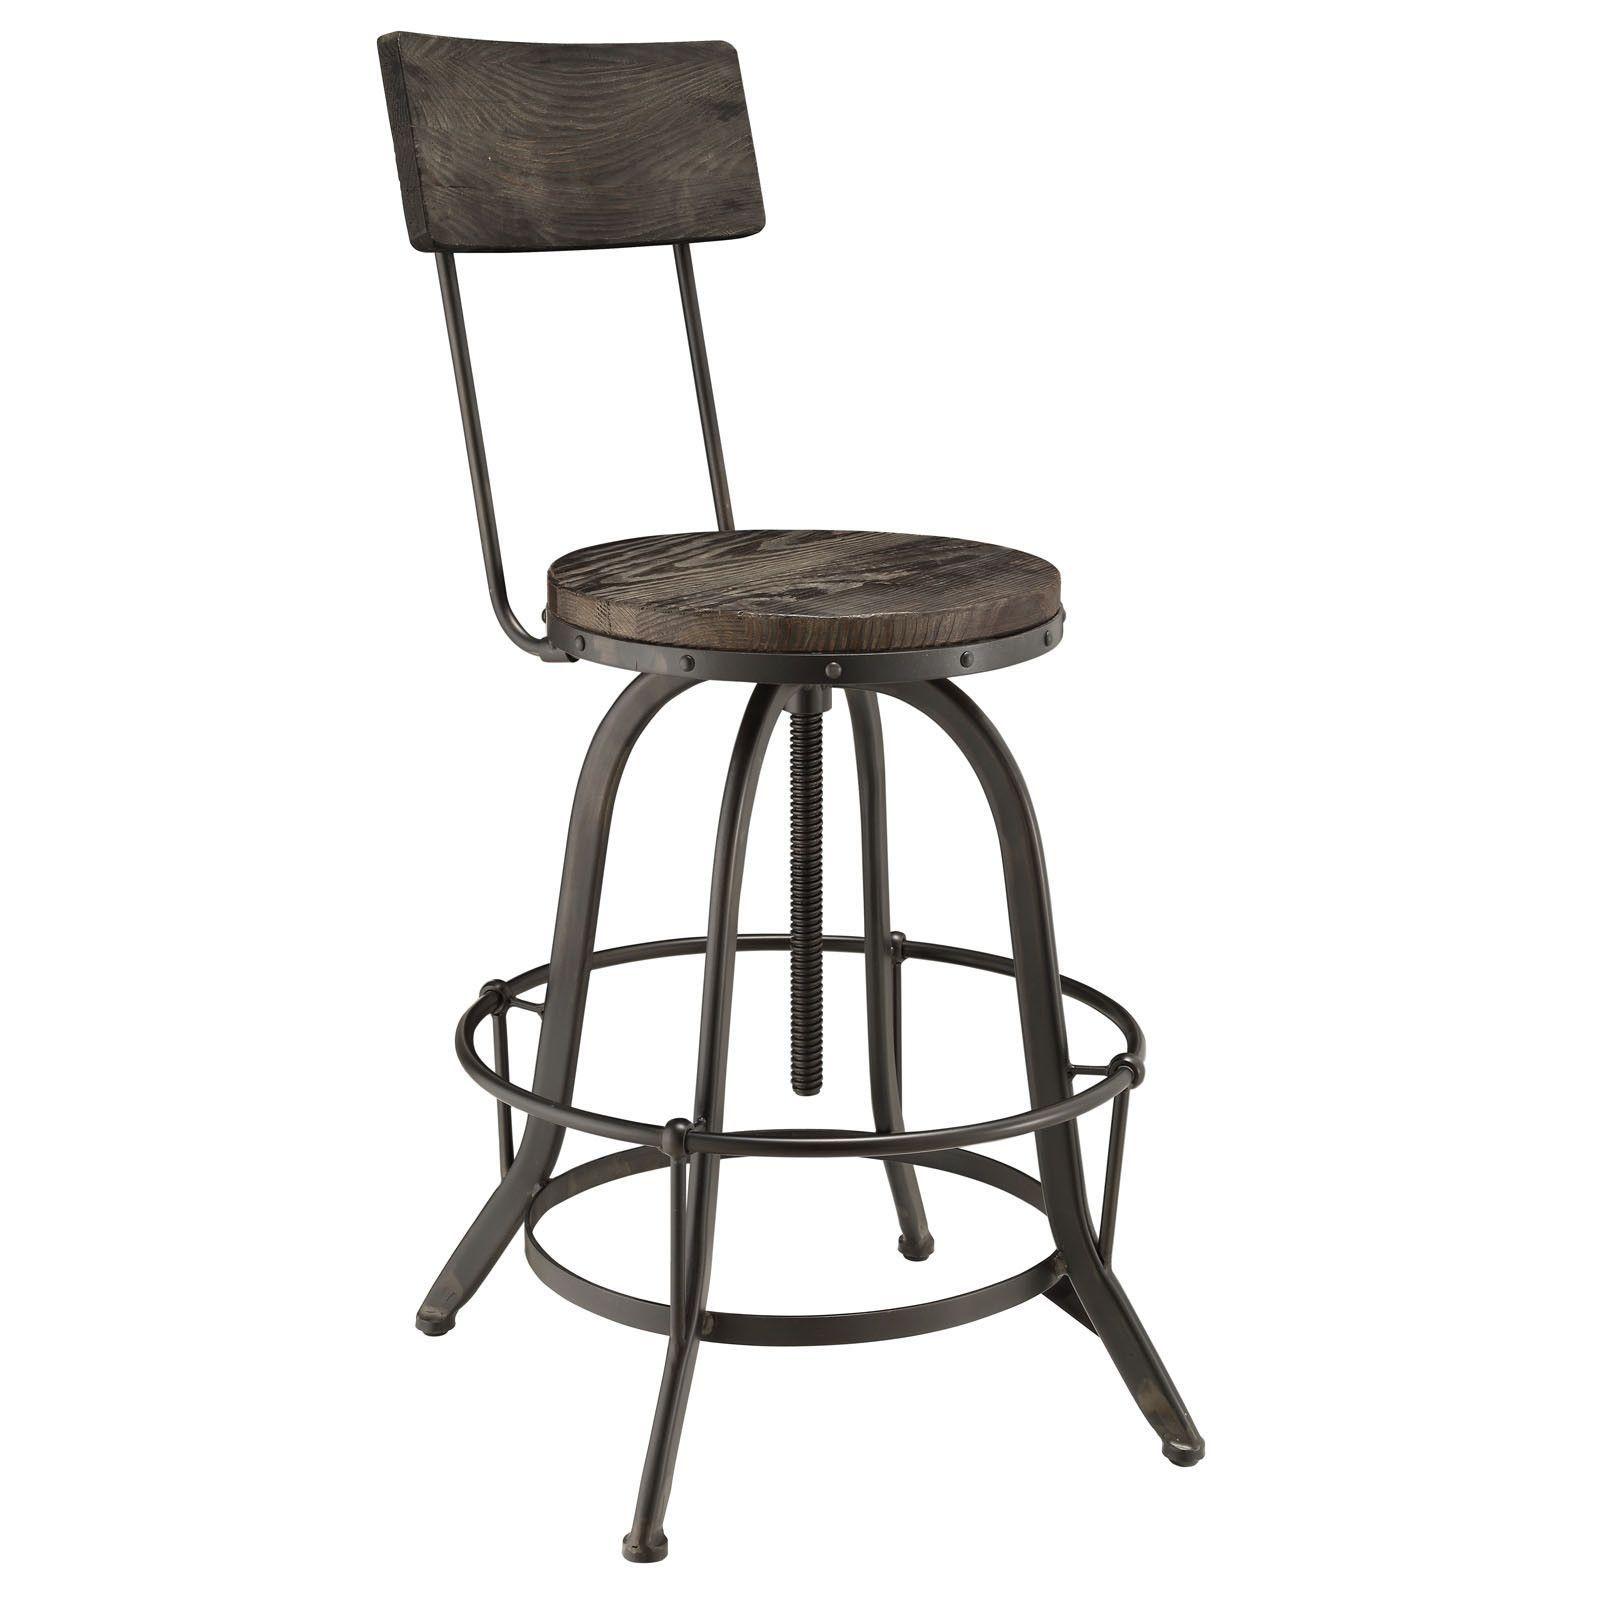 Industrial Modern Wood Bar Stool Bar Stools Adjustable Bar Stools Bar Table And Stools